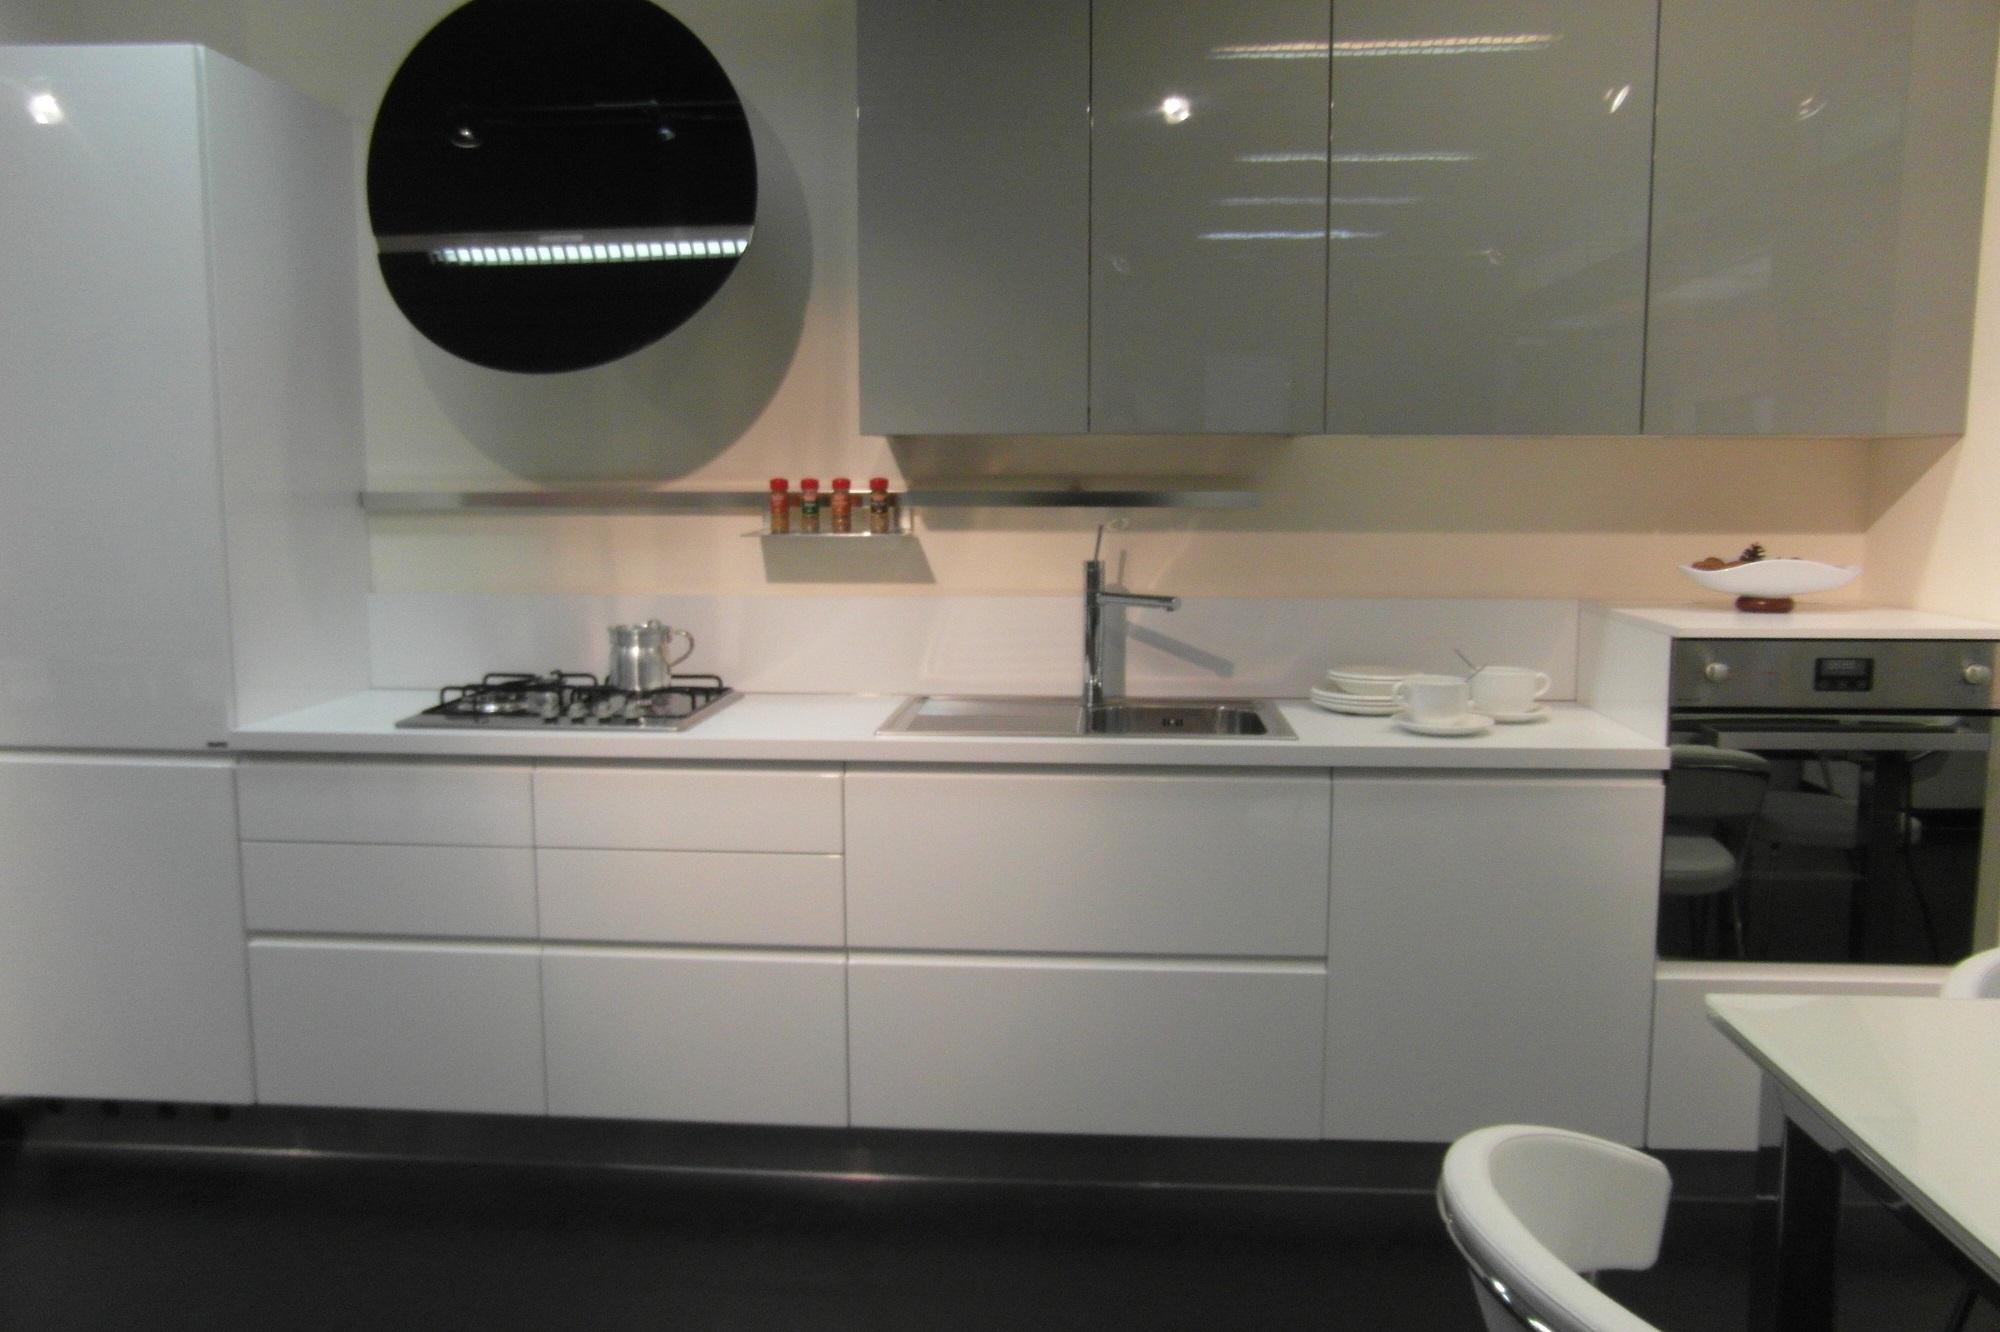 Cucina ar tre flo 39 moderna laccato lucido bianca cucine - Cucina bianca lucida ...